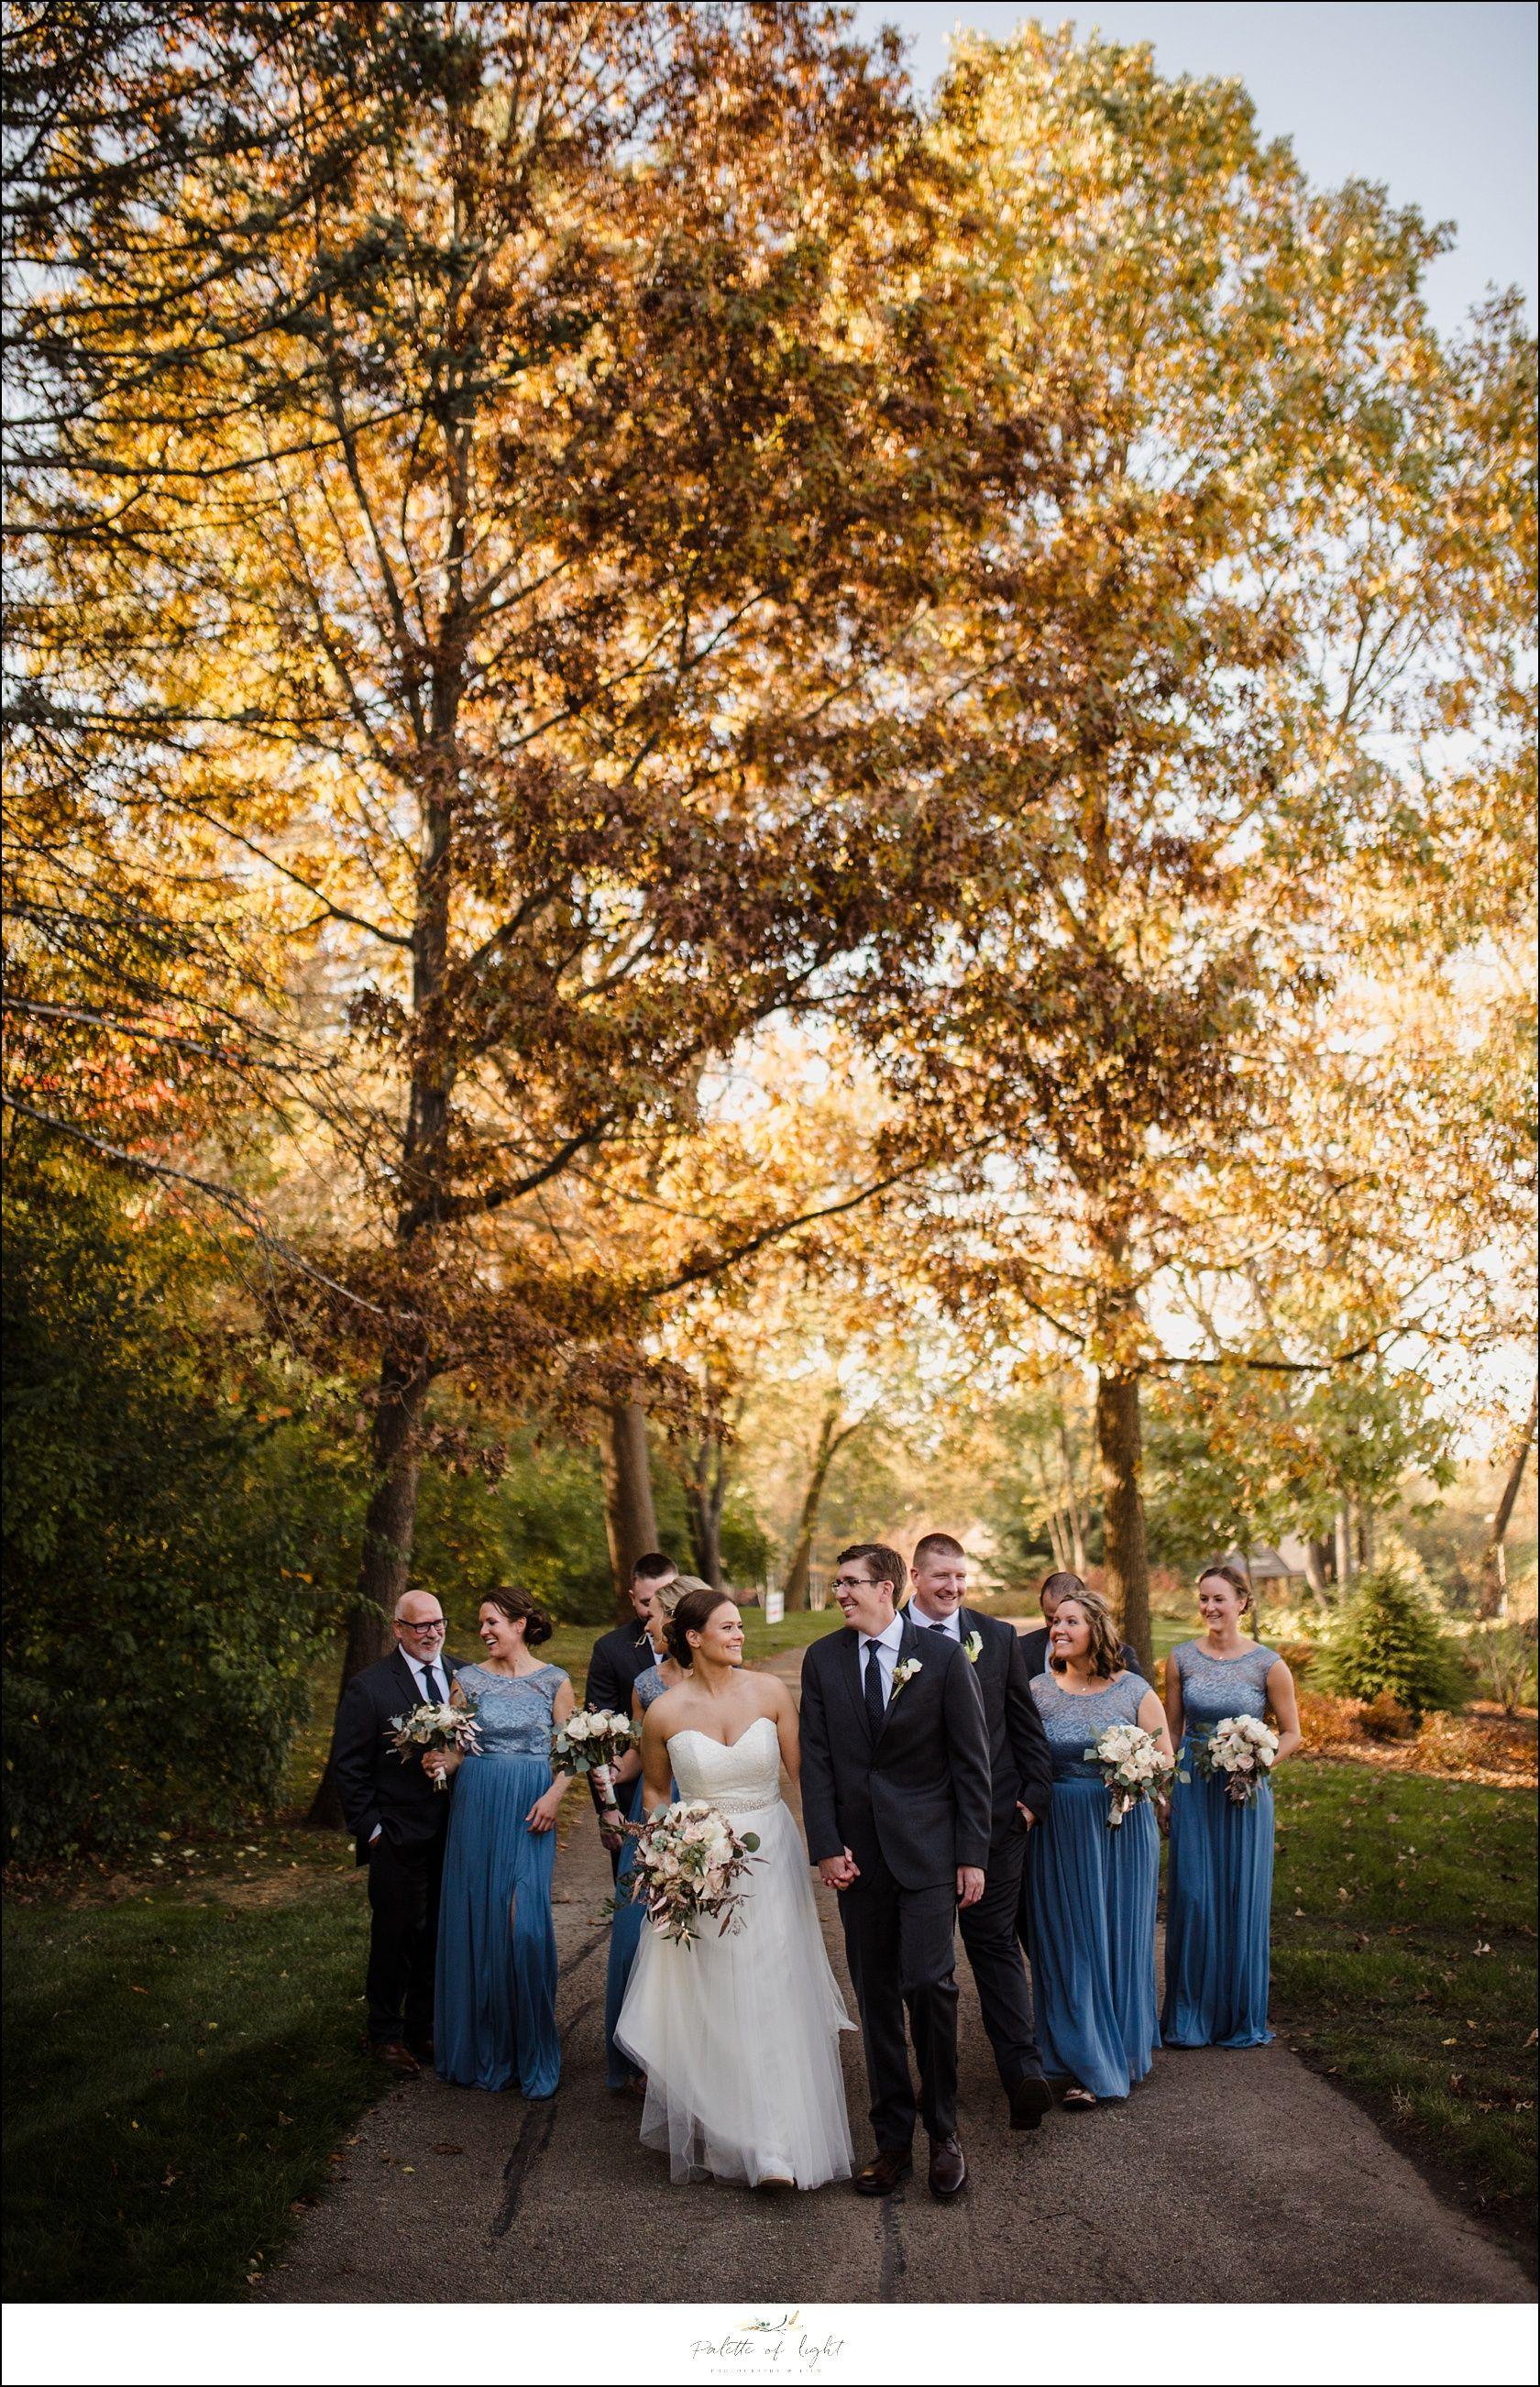 Klehm Arboretum and Botanic Garden, Rockford, Illinois wedding ...